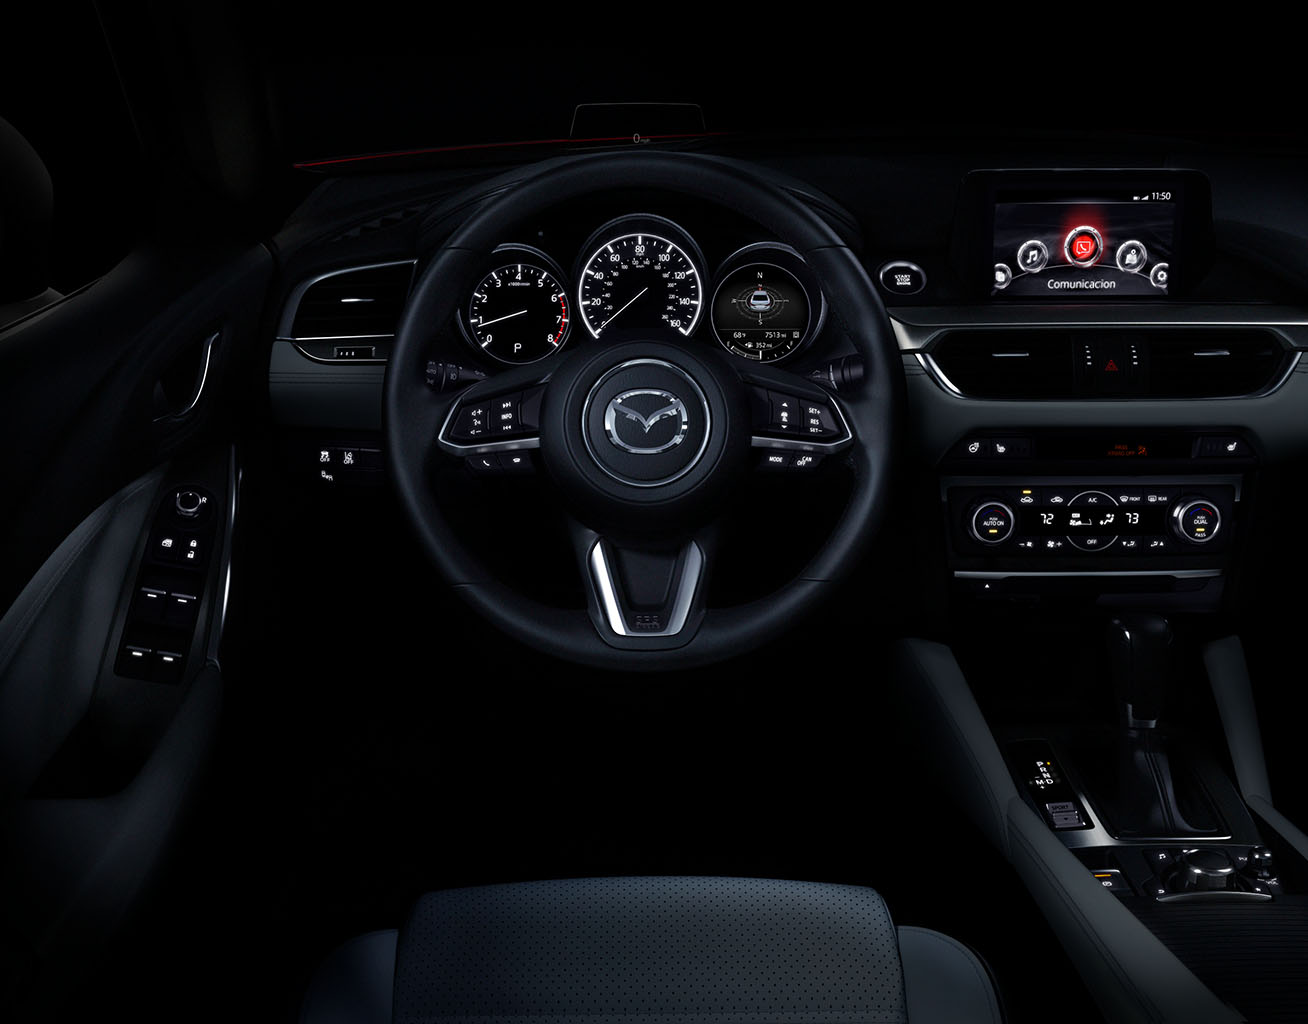 2018 Mazda Cx 7 New Car Release Date And Review 2018 Amanda Felicia